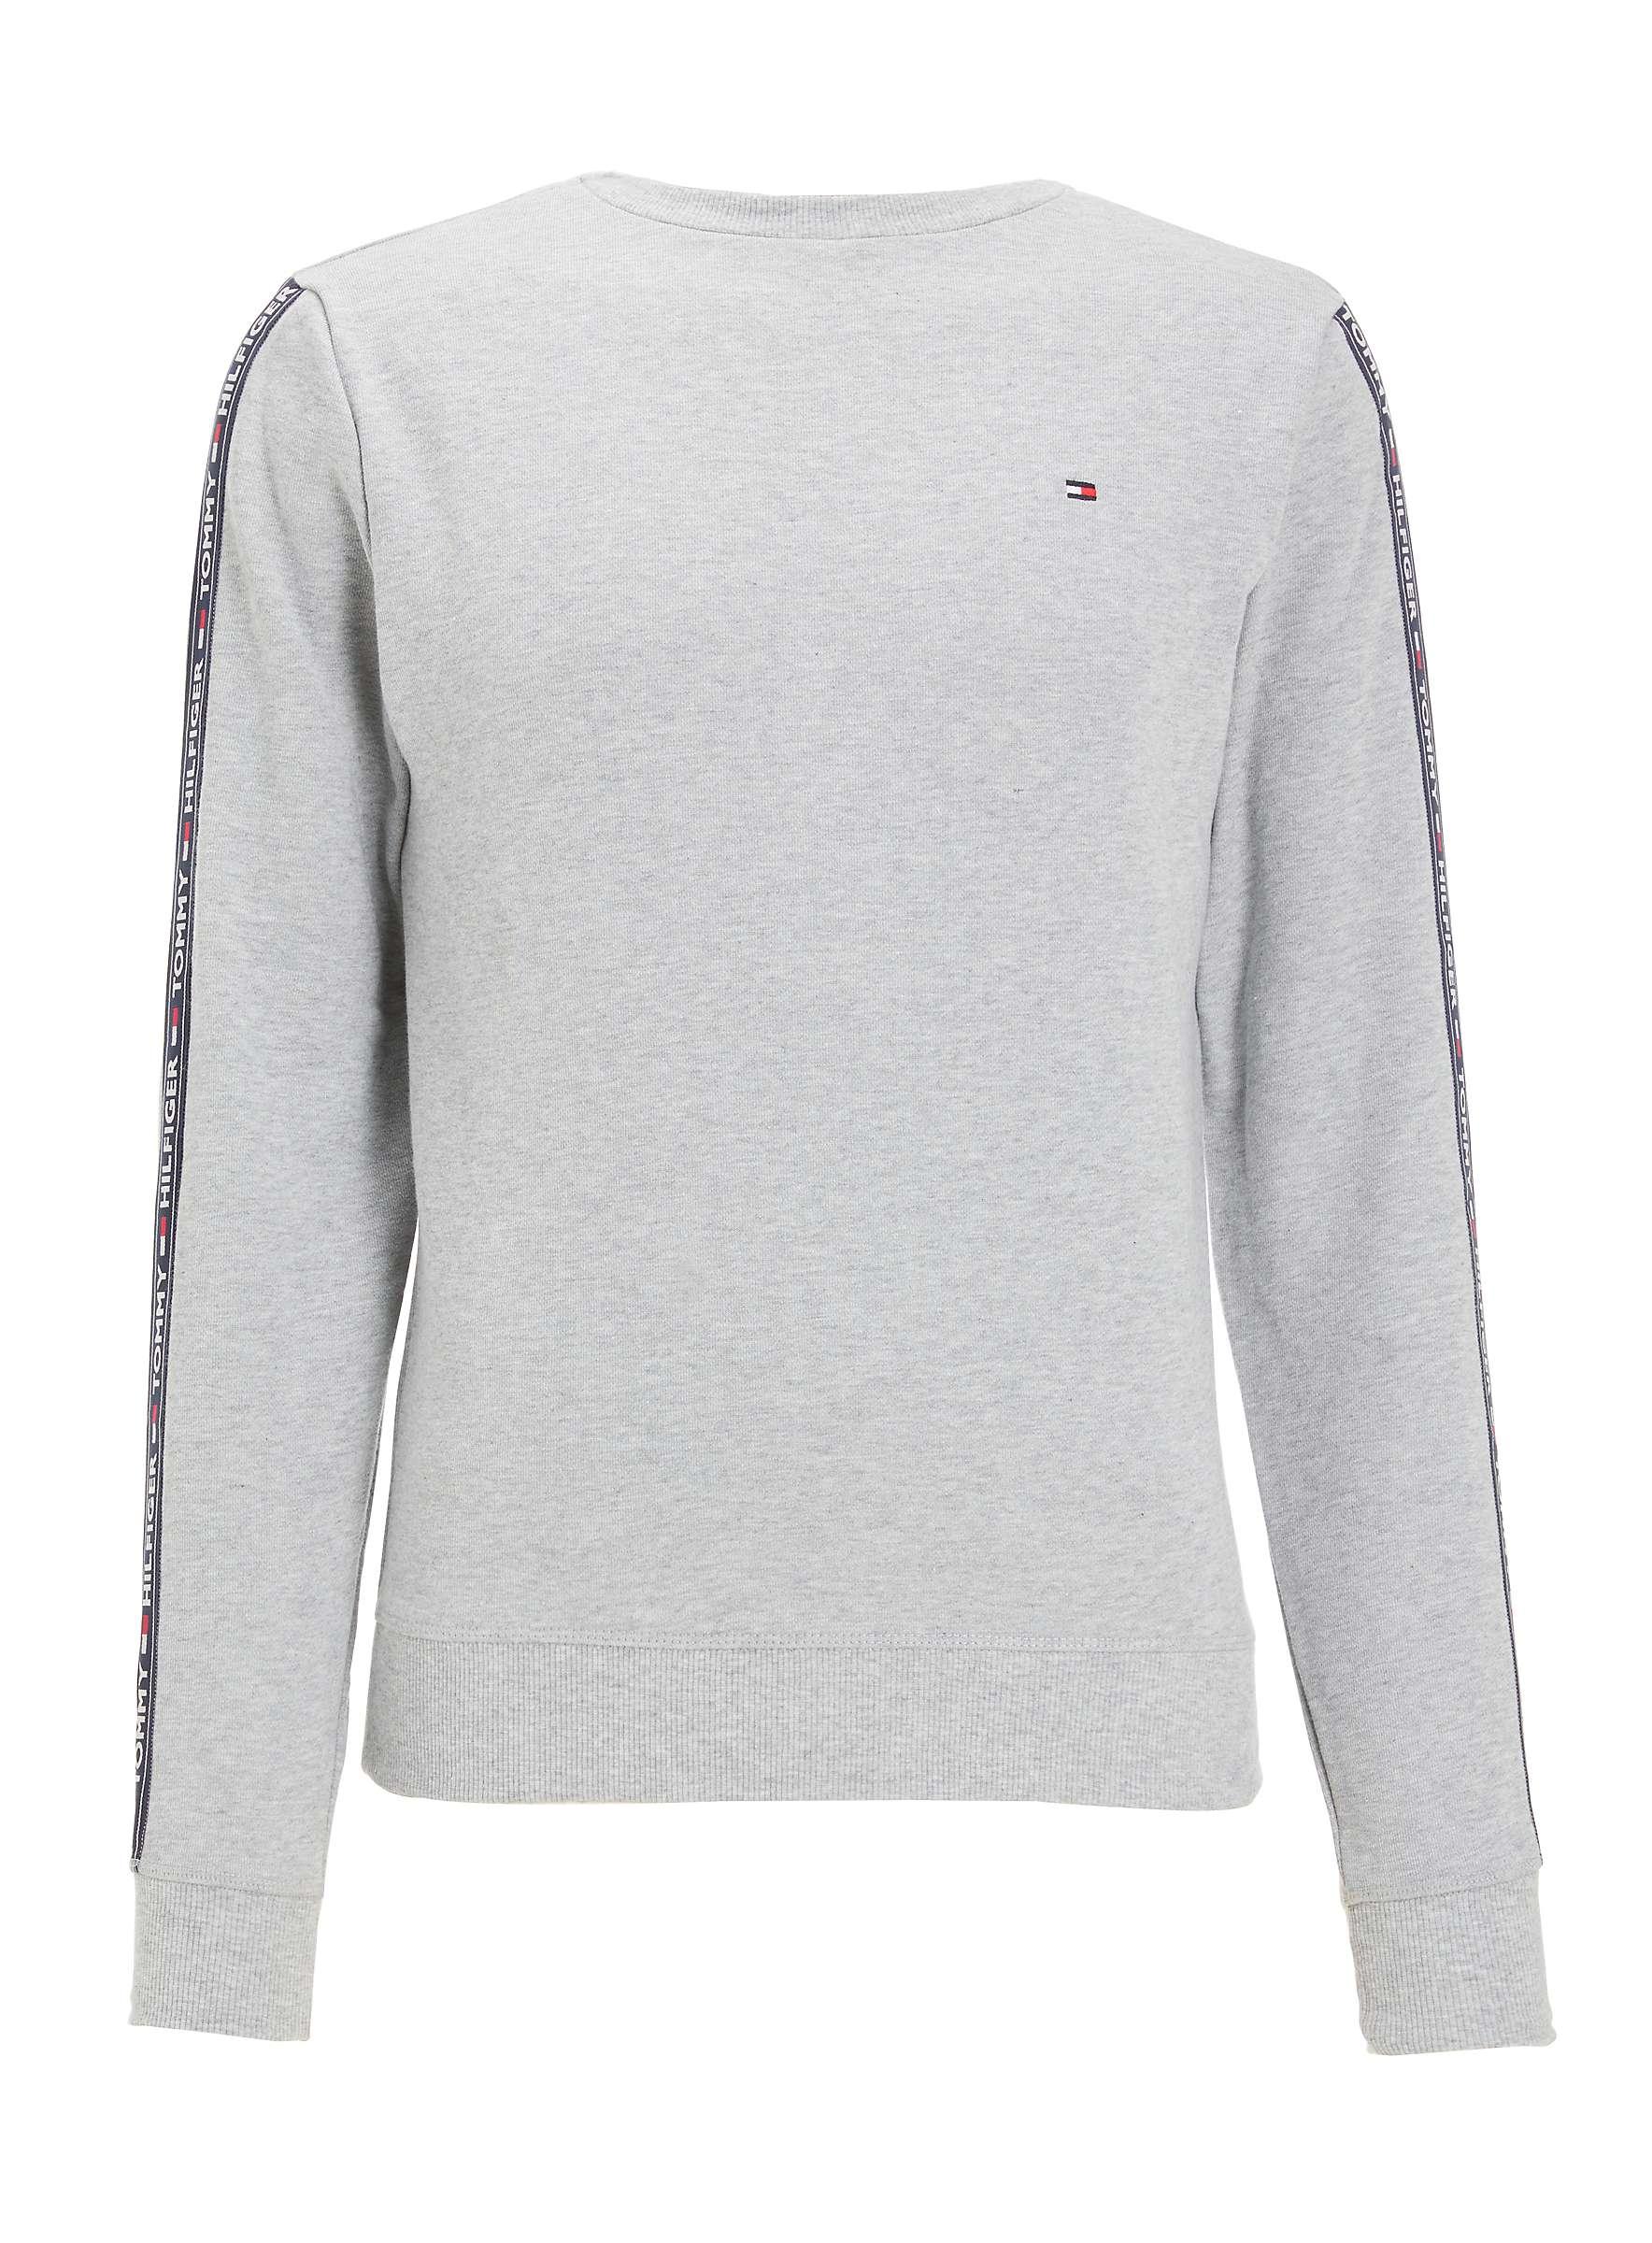 Tommy Hilfiger Taped Logo Sweatshirt Grey Sizes S-XL